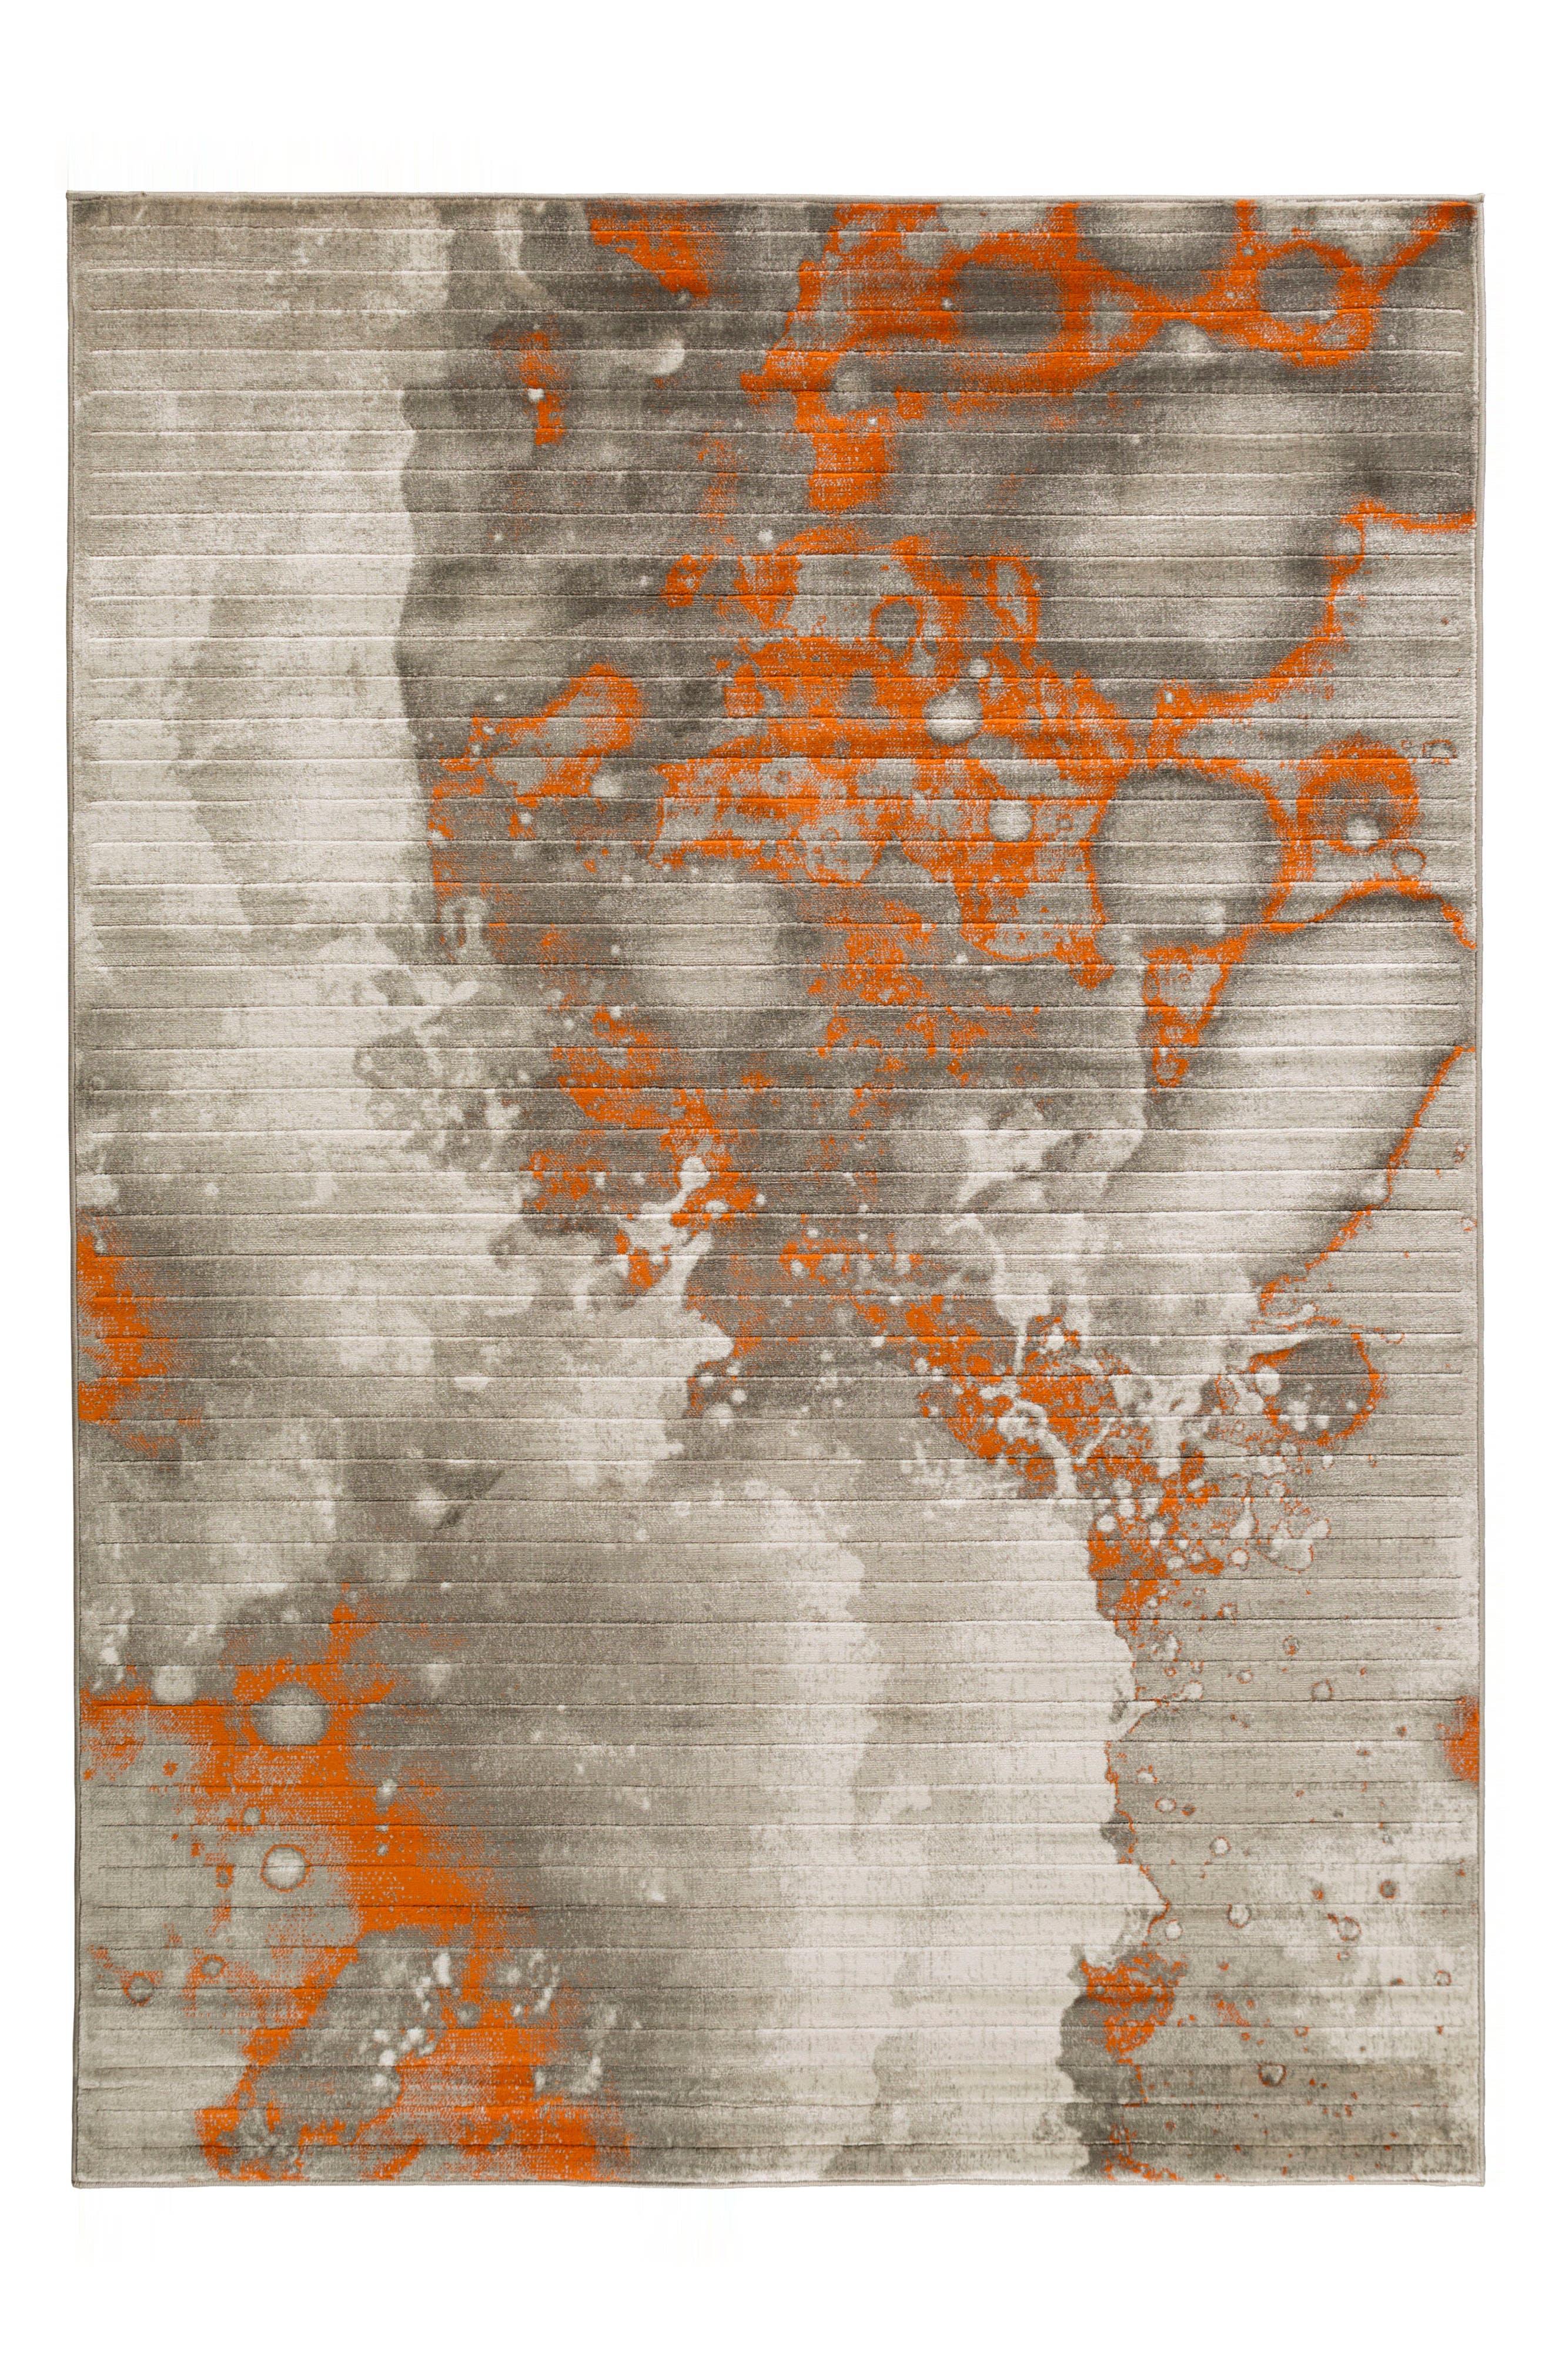 Alternate Image 1 Selected - Surya Home Jax Area Rug